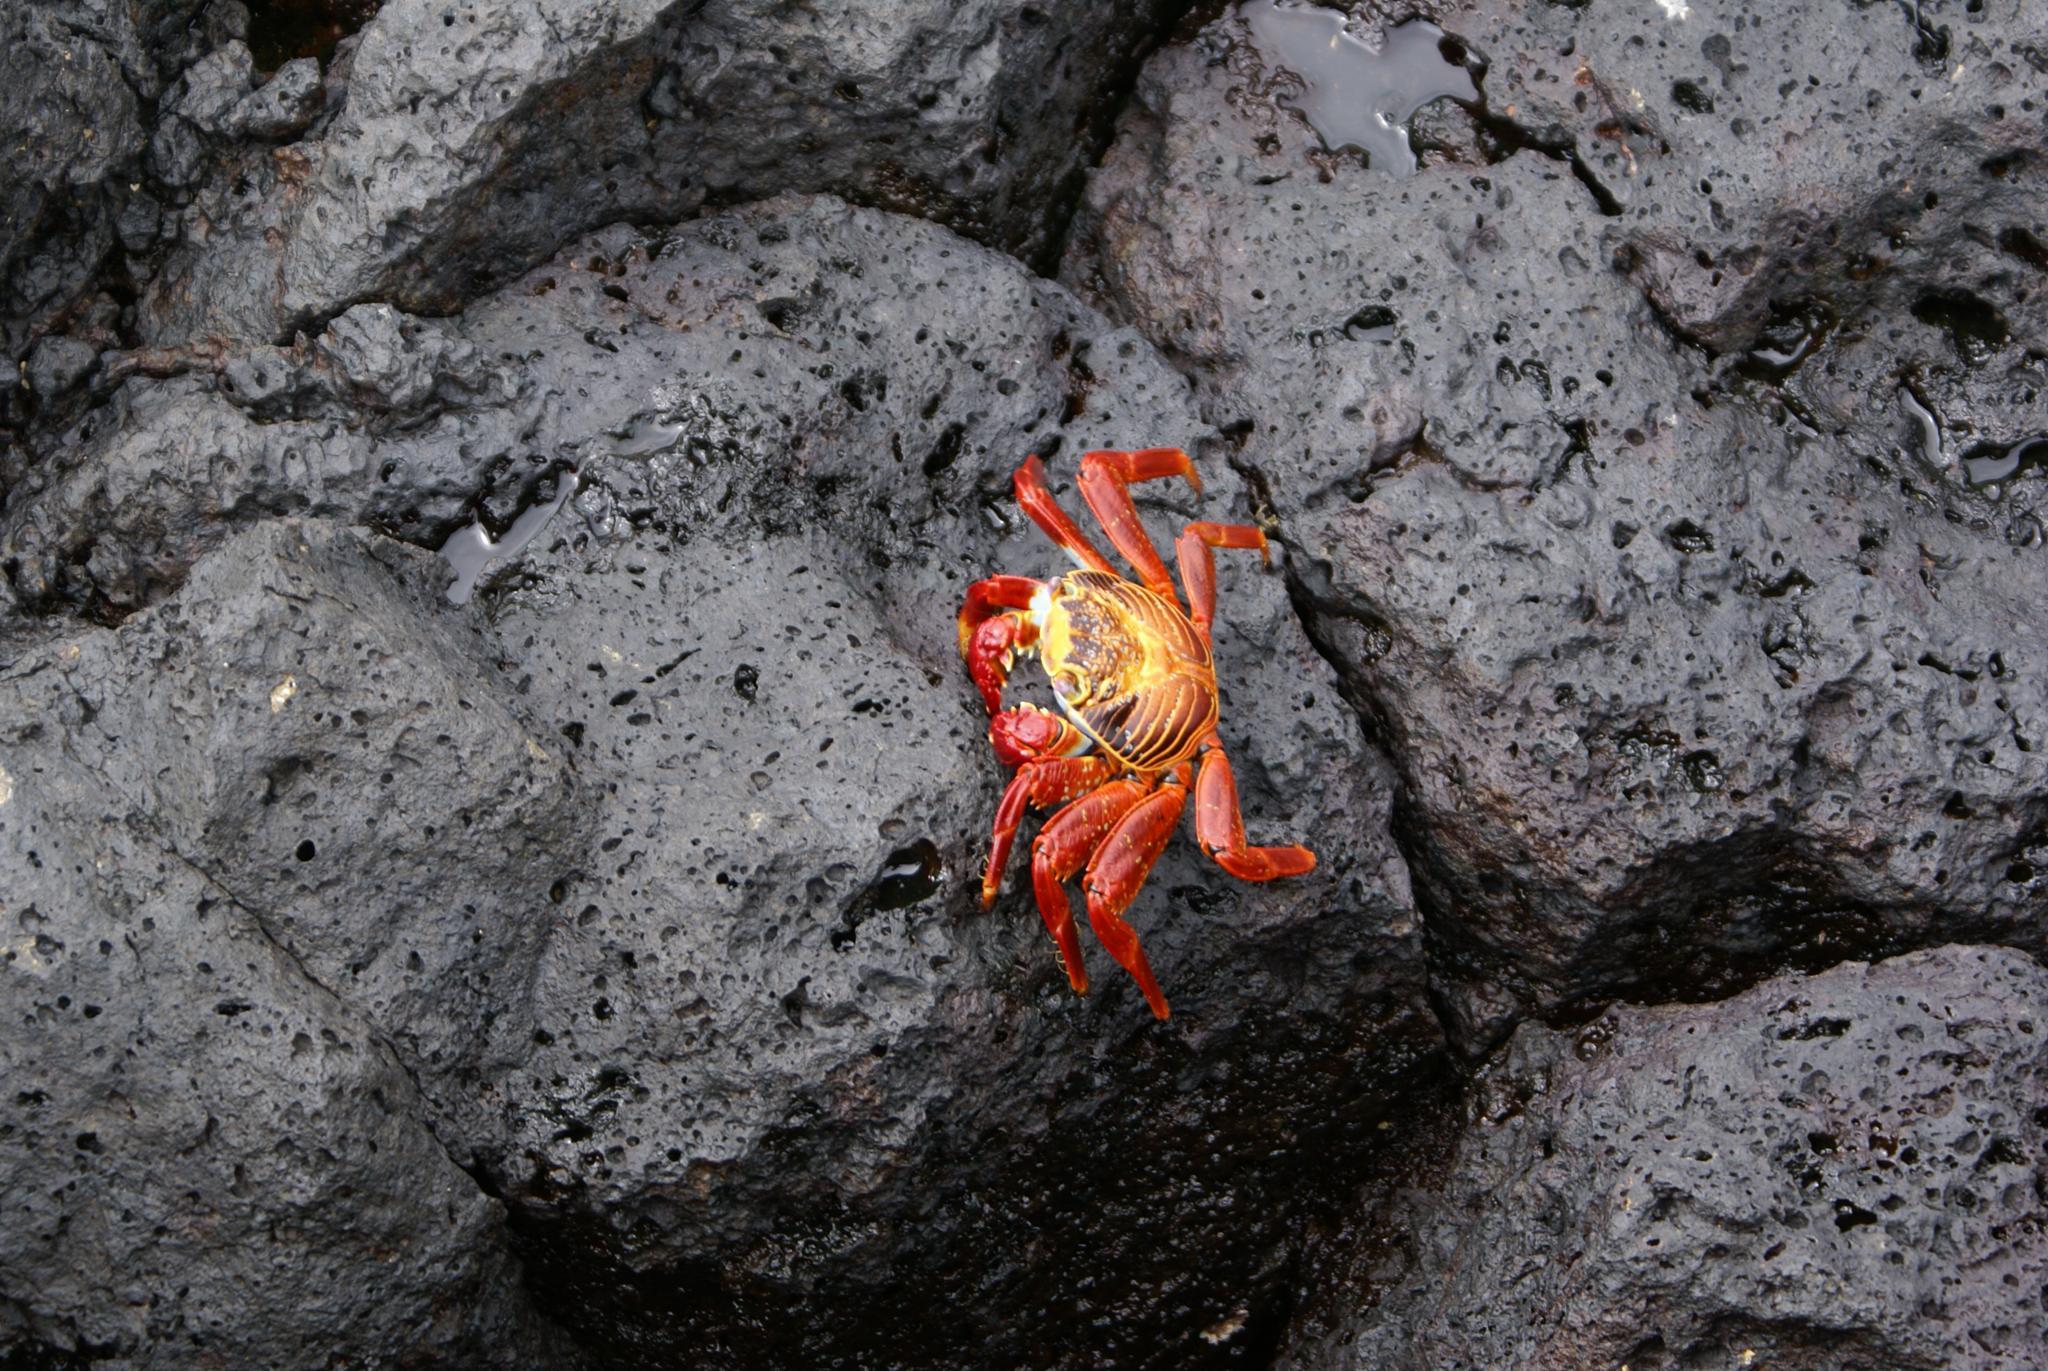 Rock  crab  Galapagos Islands by moti.vagman